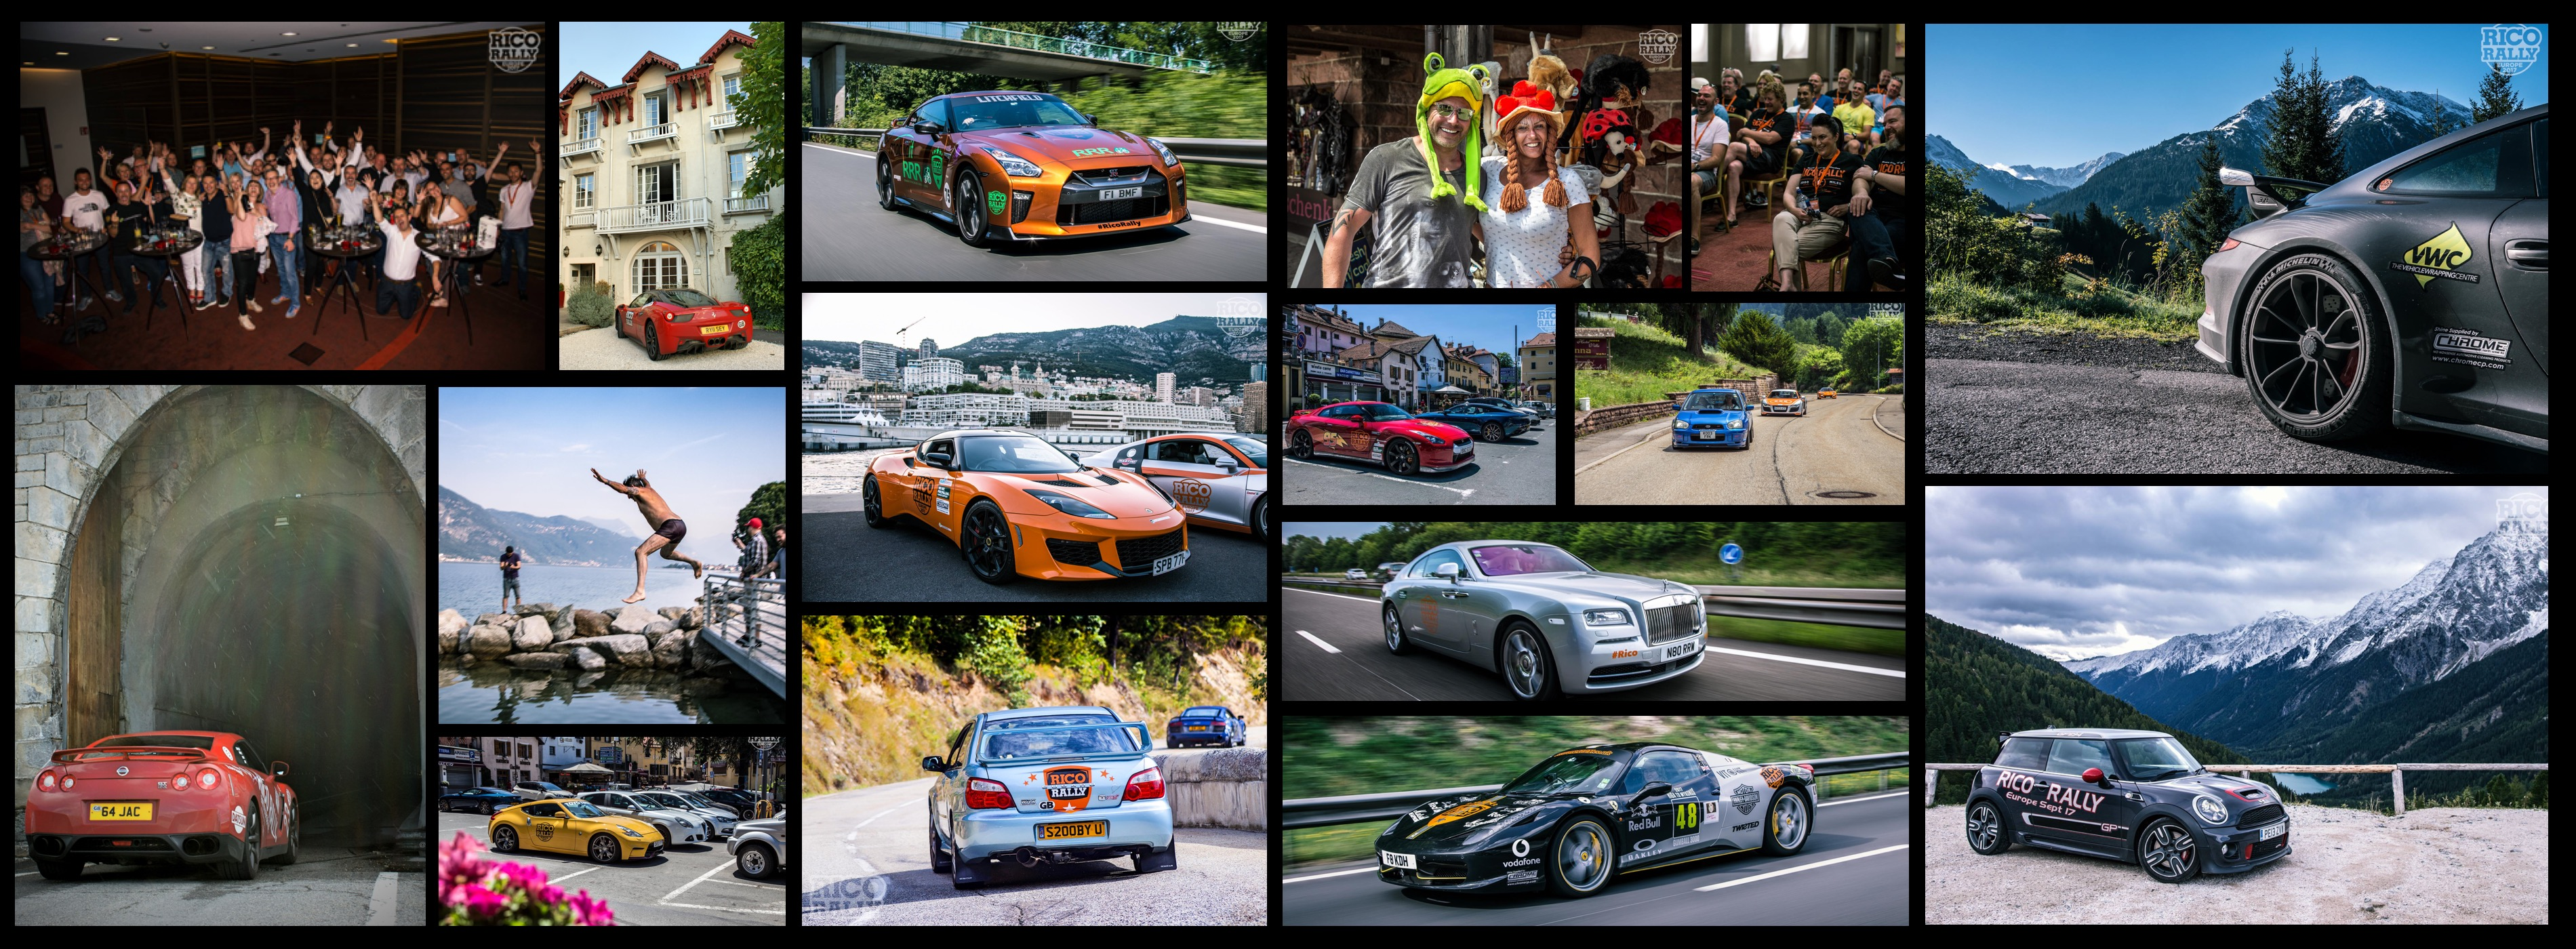 Rico-Rally-Website-Montage